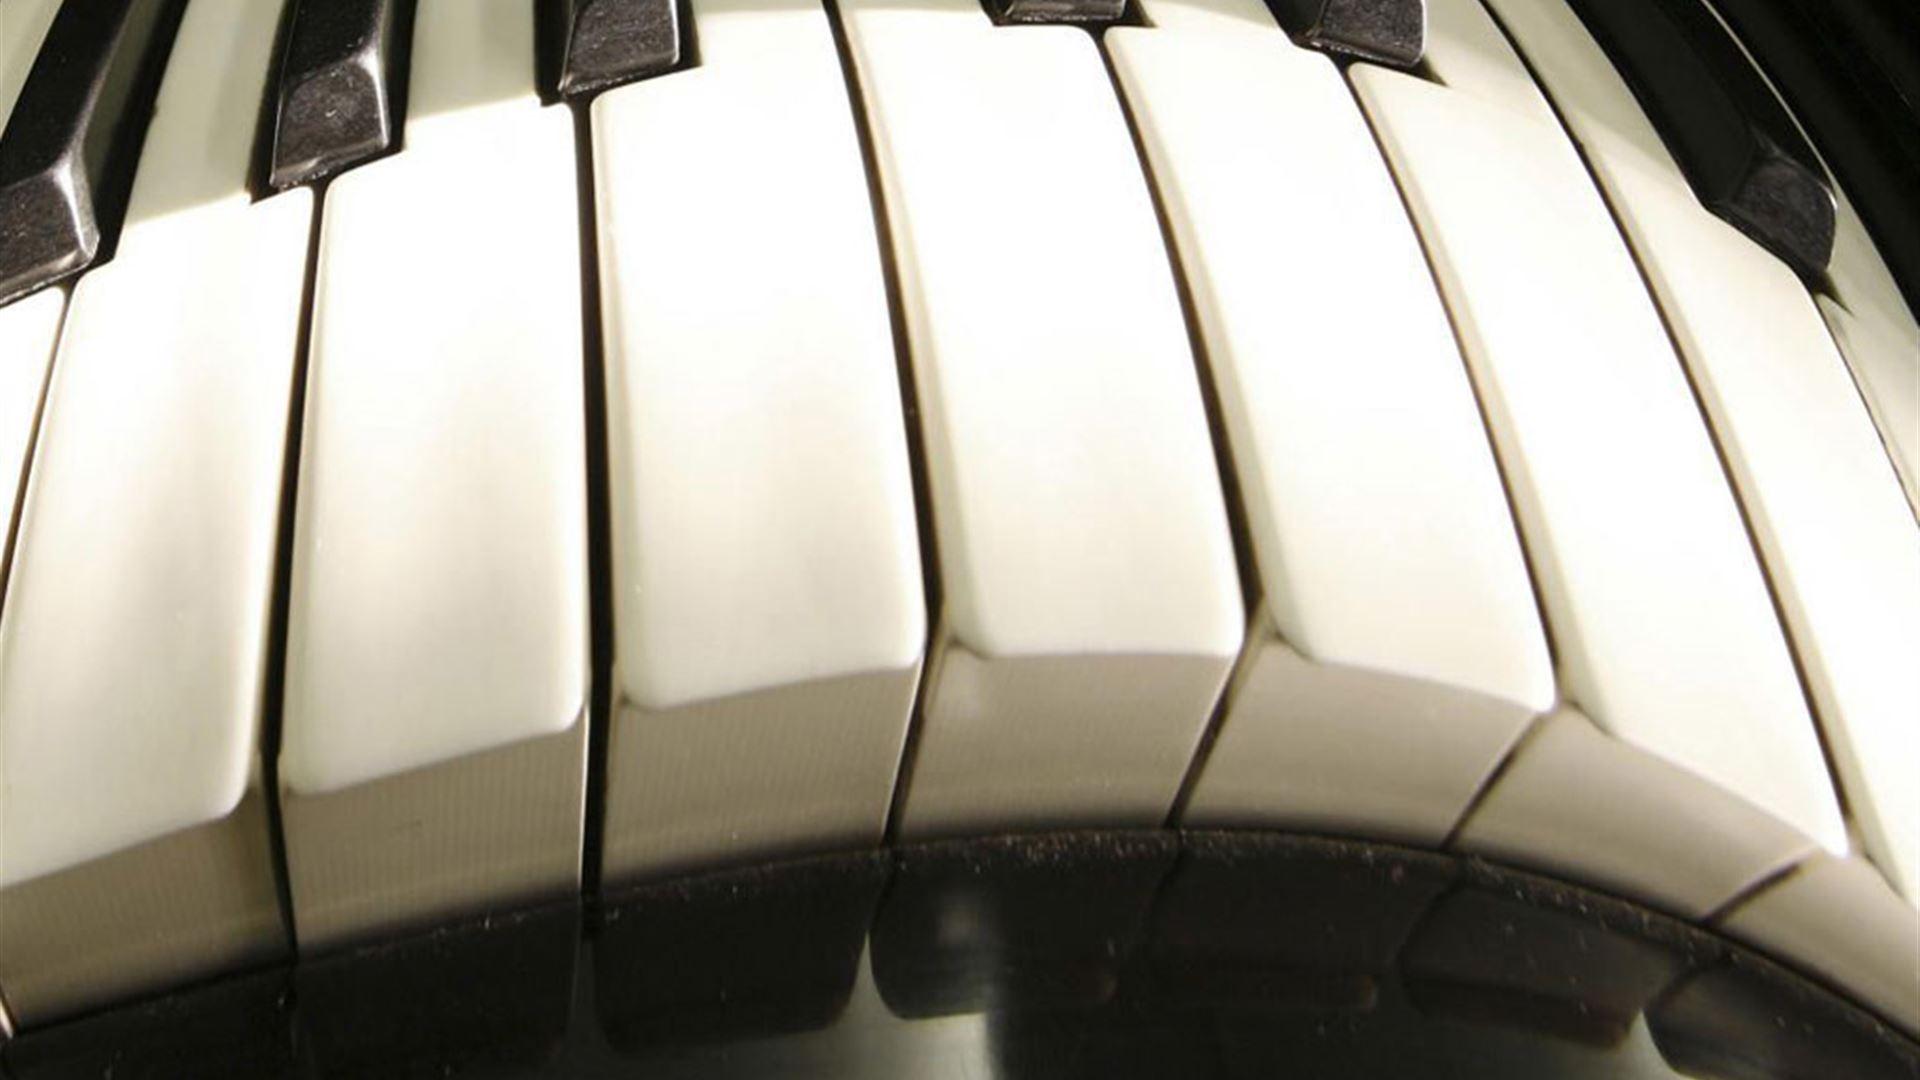 Piano Keyboard Artistic Ipad Wallpapers Free Download